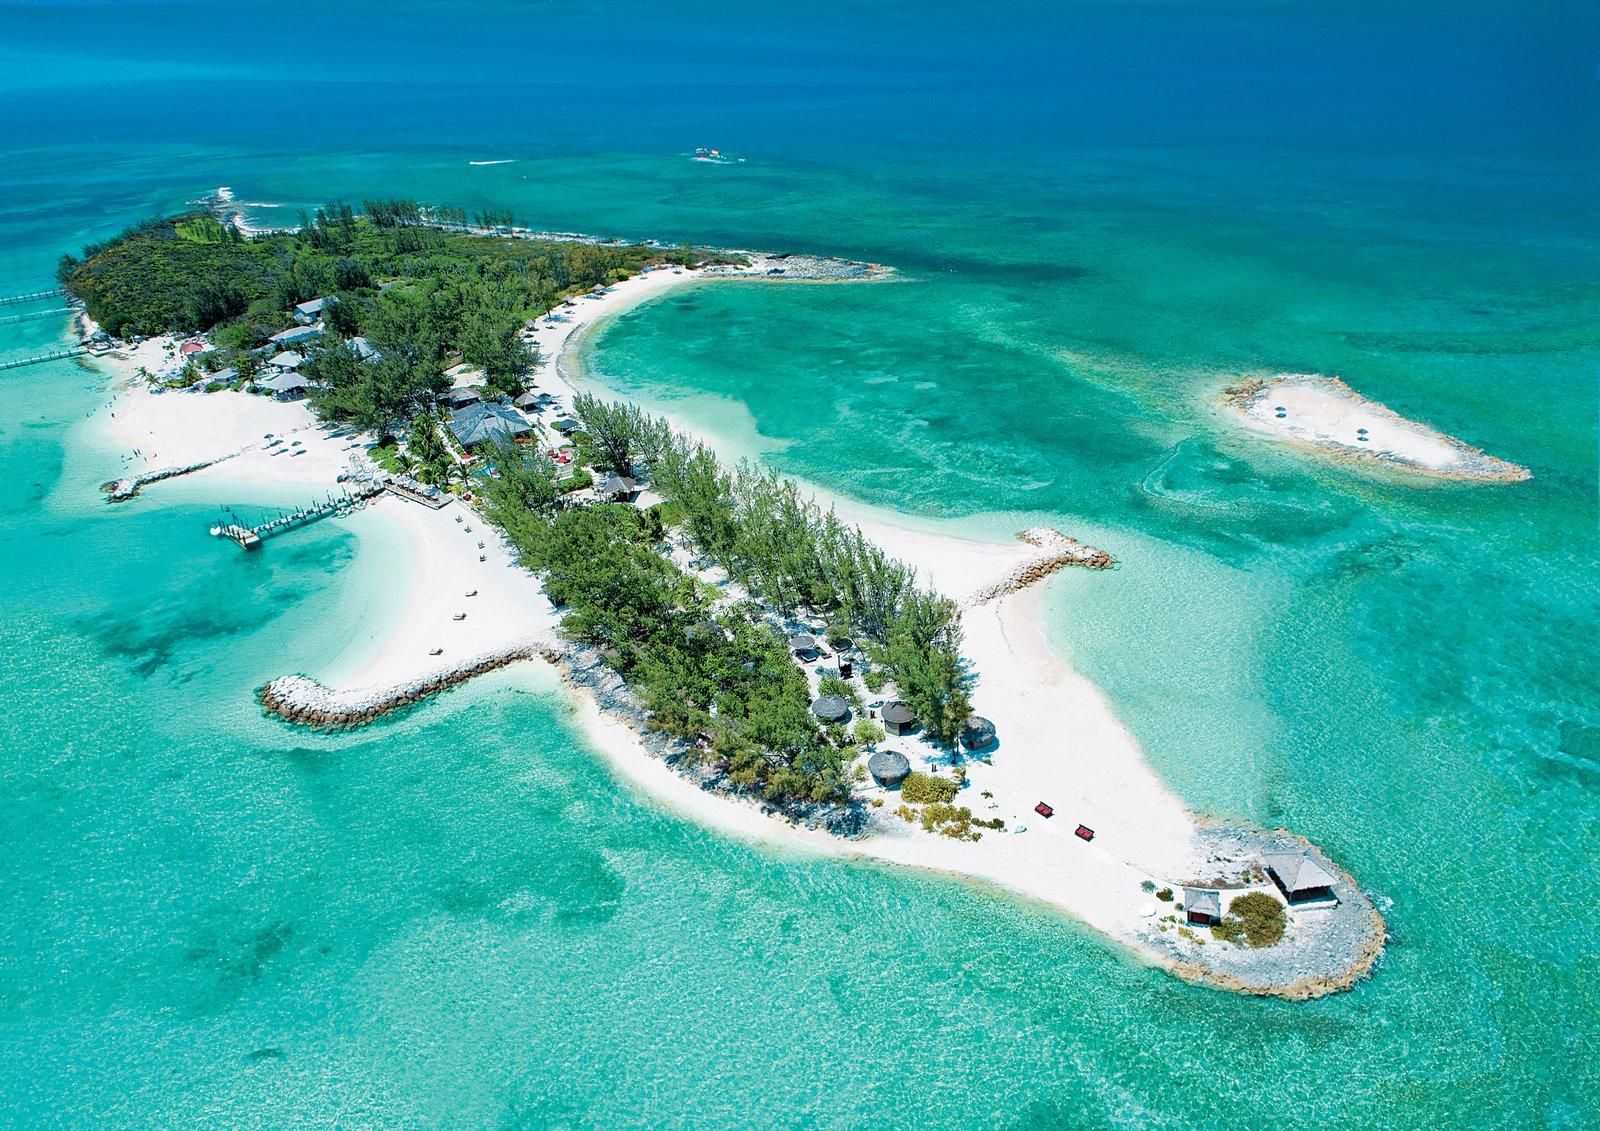 Sandals Royal Bahamian Private Island